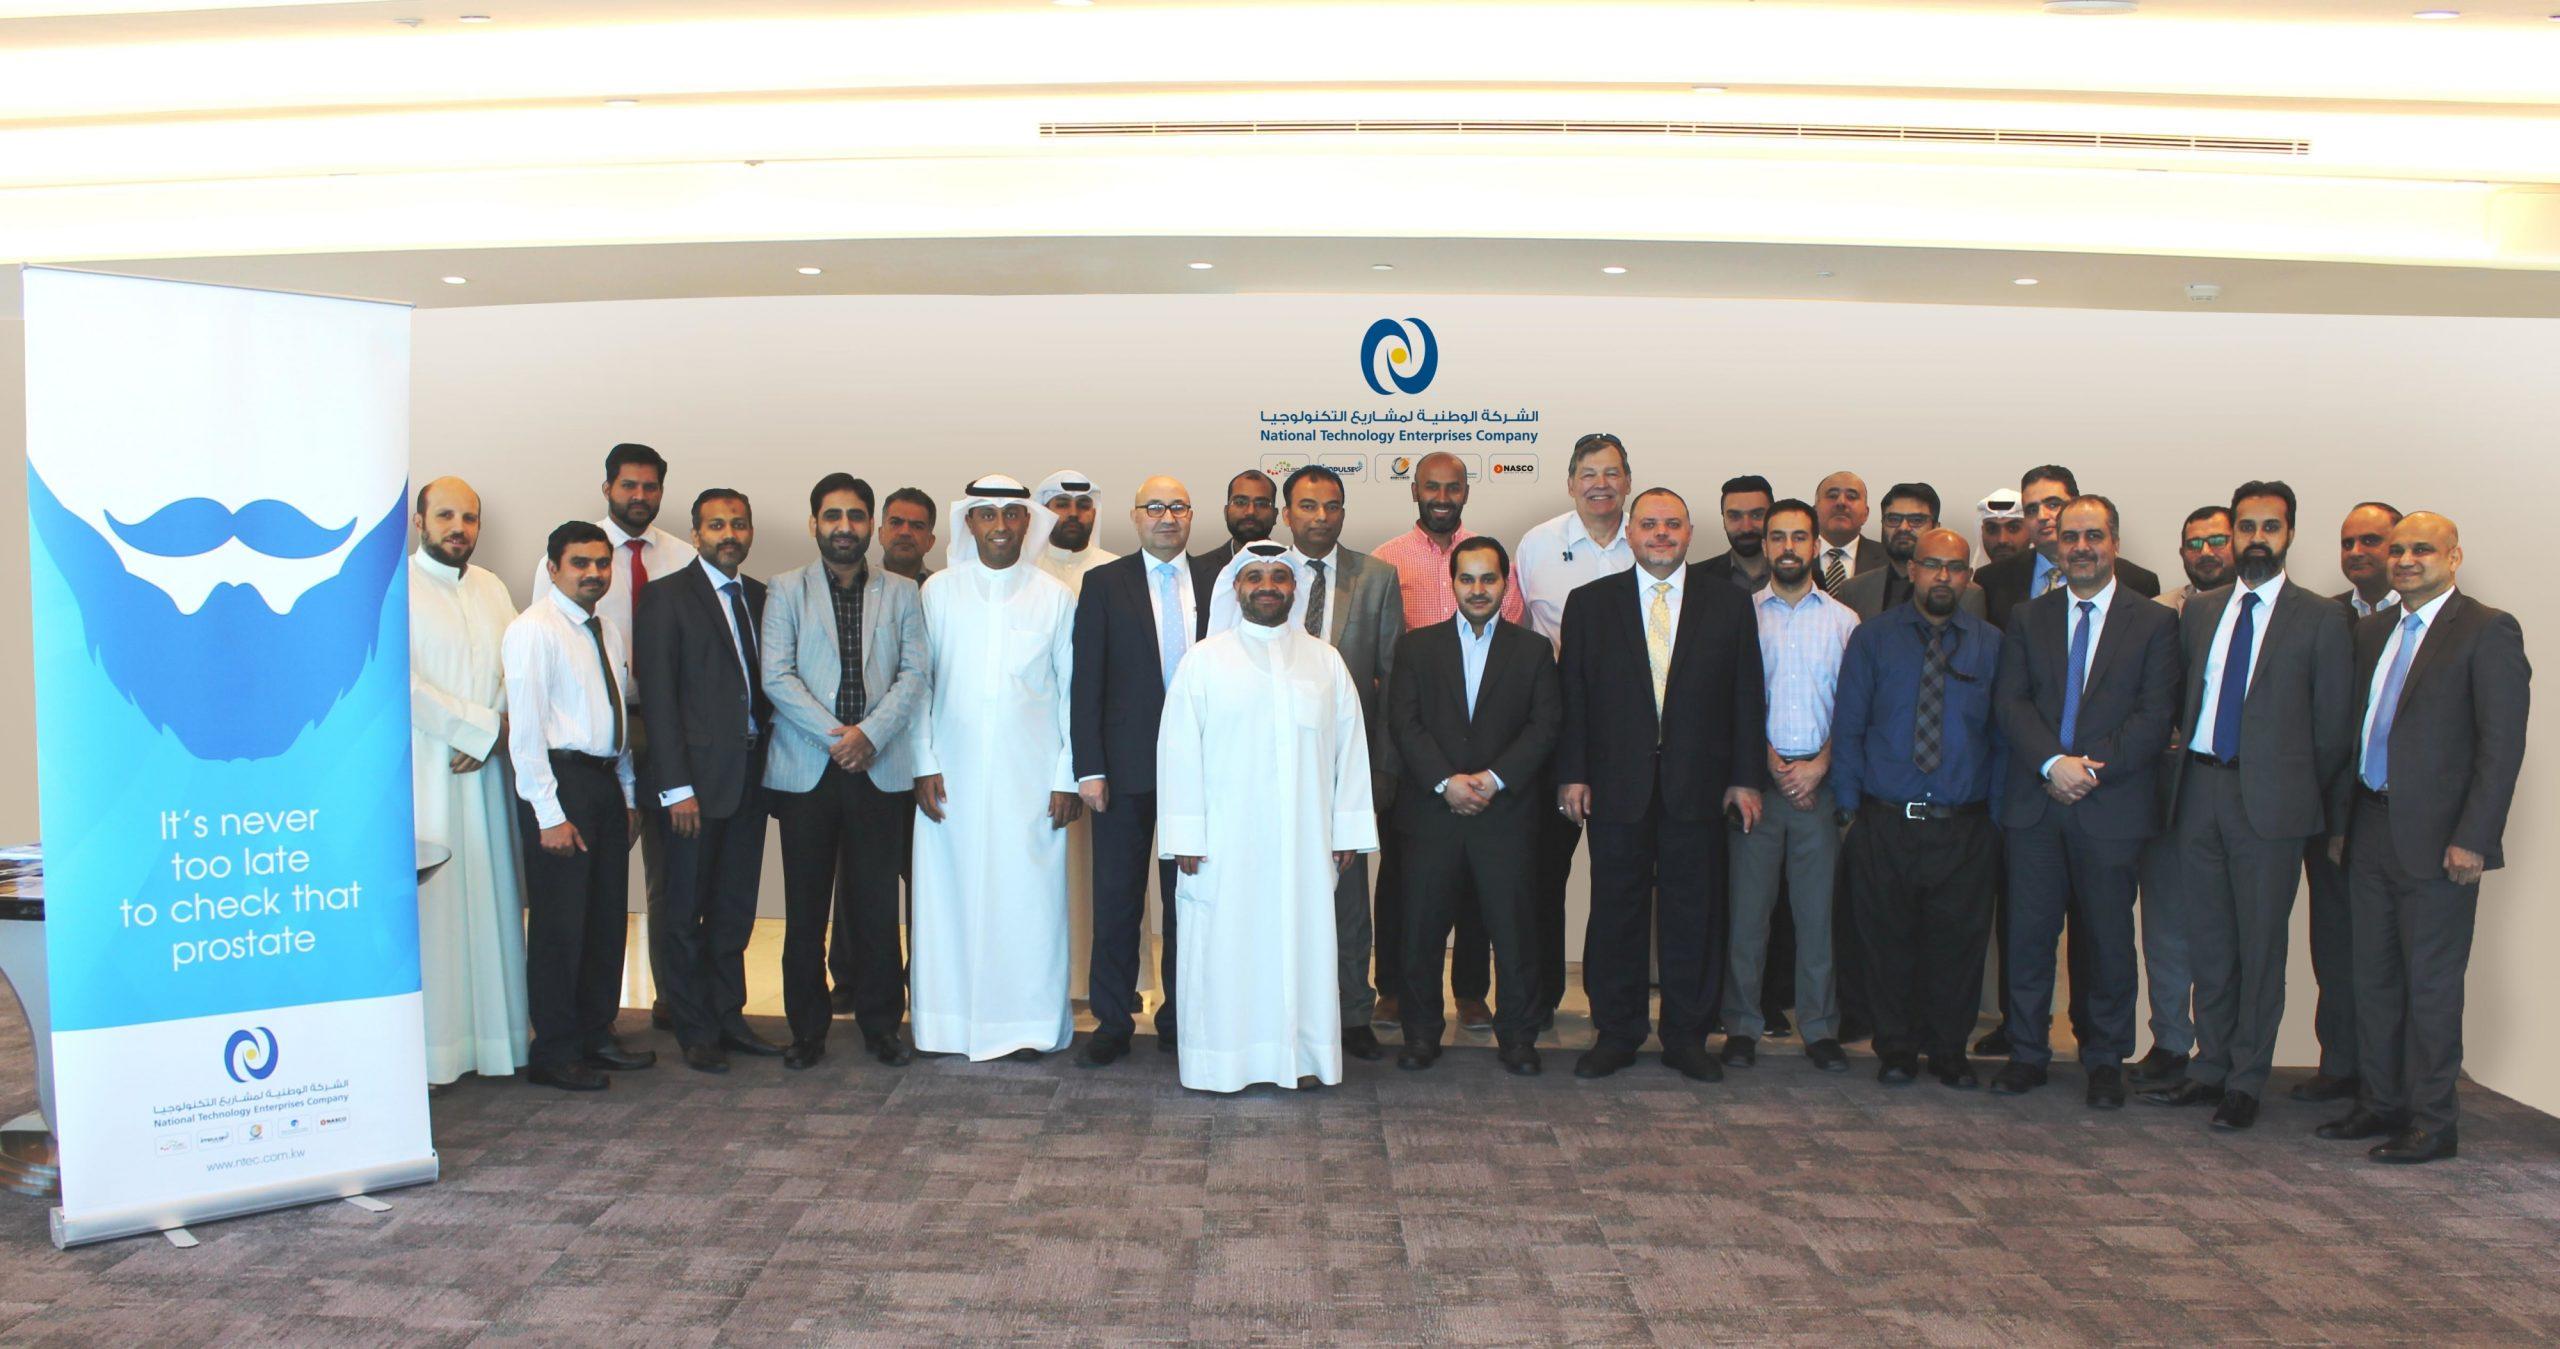 National Technology Enterprises Company holds a Prostate Cancer Awareness Seminar